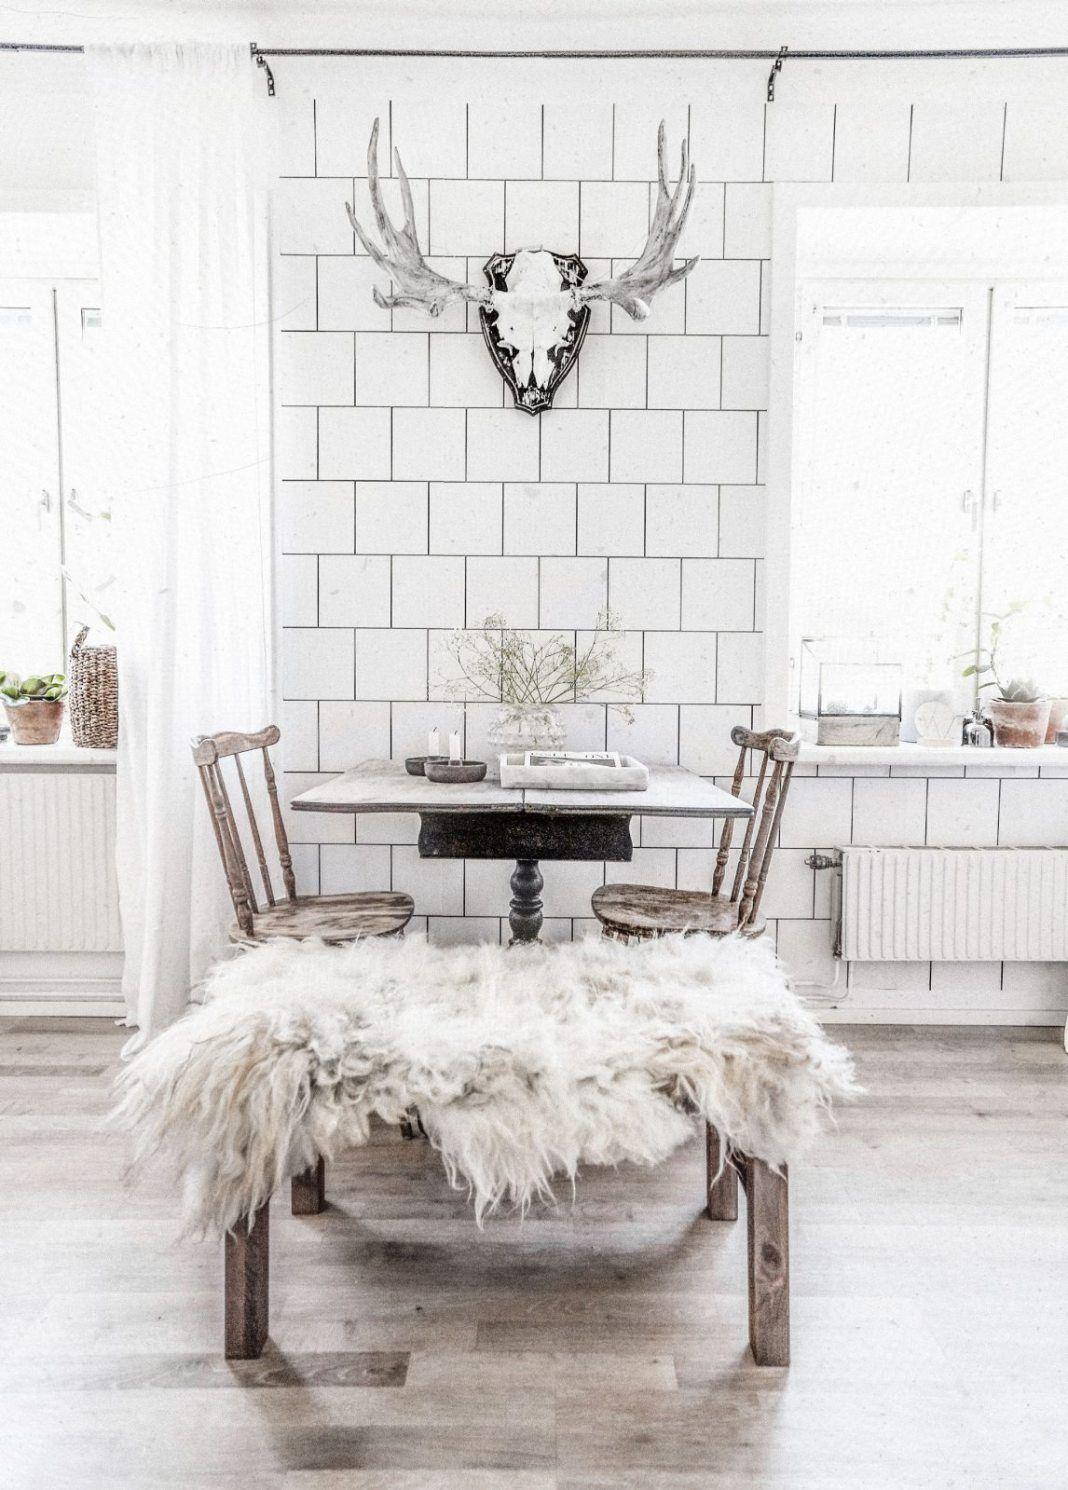 Beau White Tile Wallpaper In Madelene Billmanu0027s Kitchen   We Love The Look!  #scandinaviankitchen #kitcheninspo #wallpaper #wallmural #tiles #whitetiles  #kakel ...